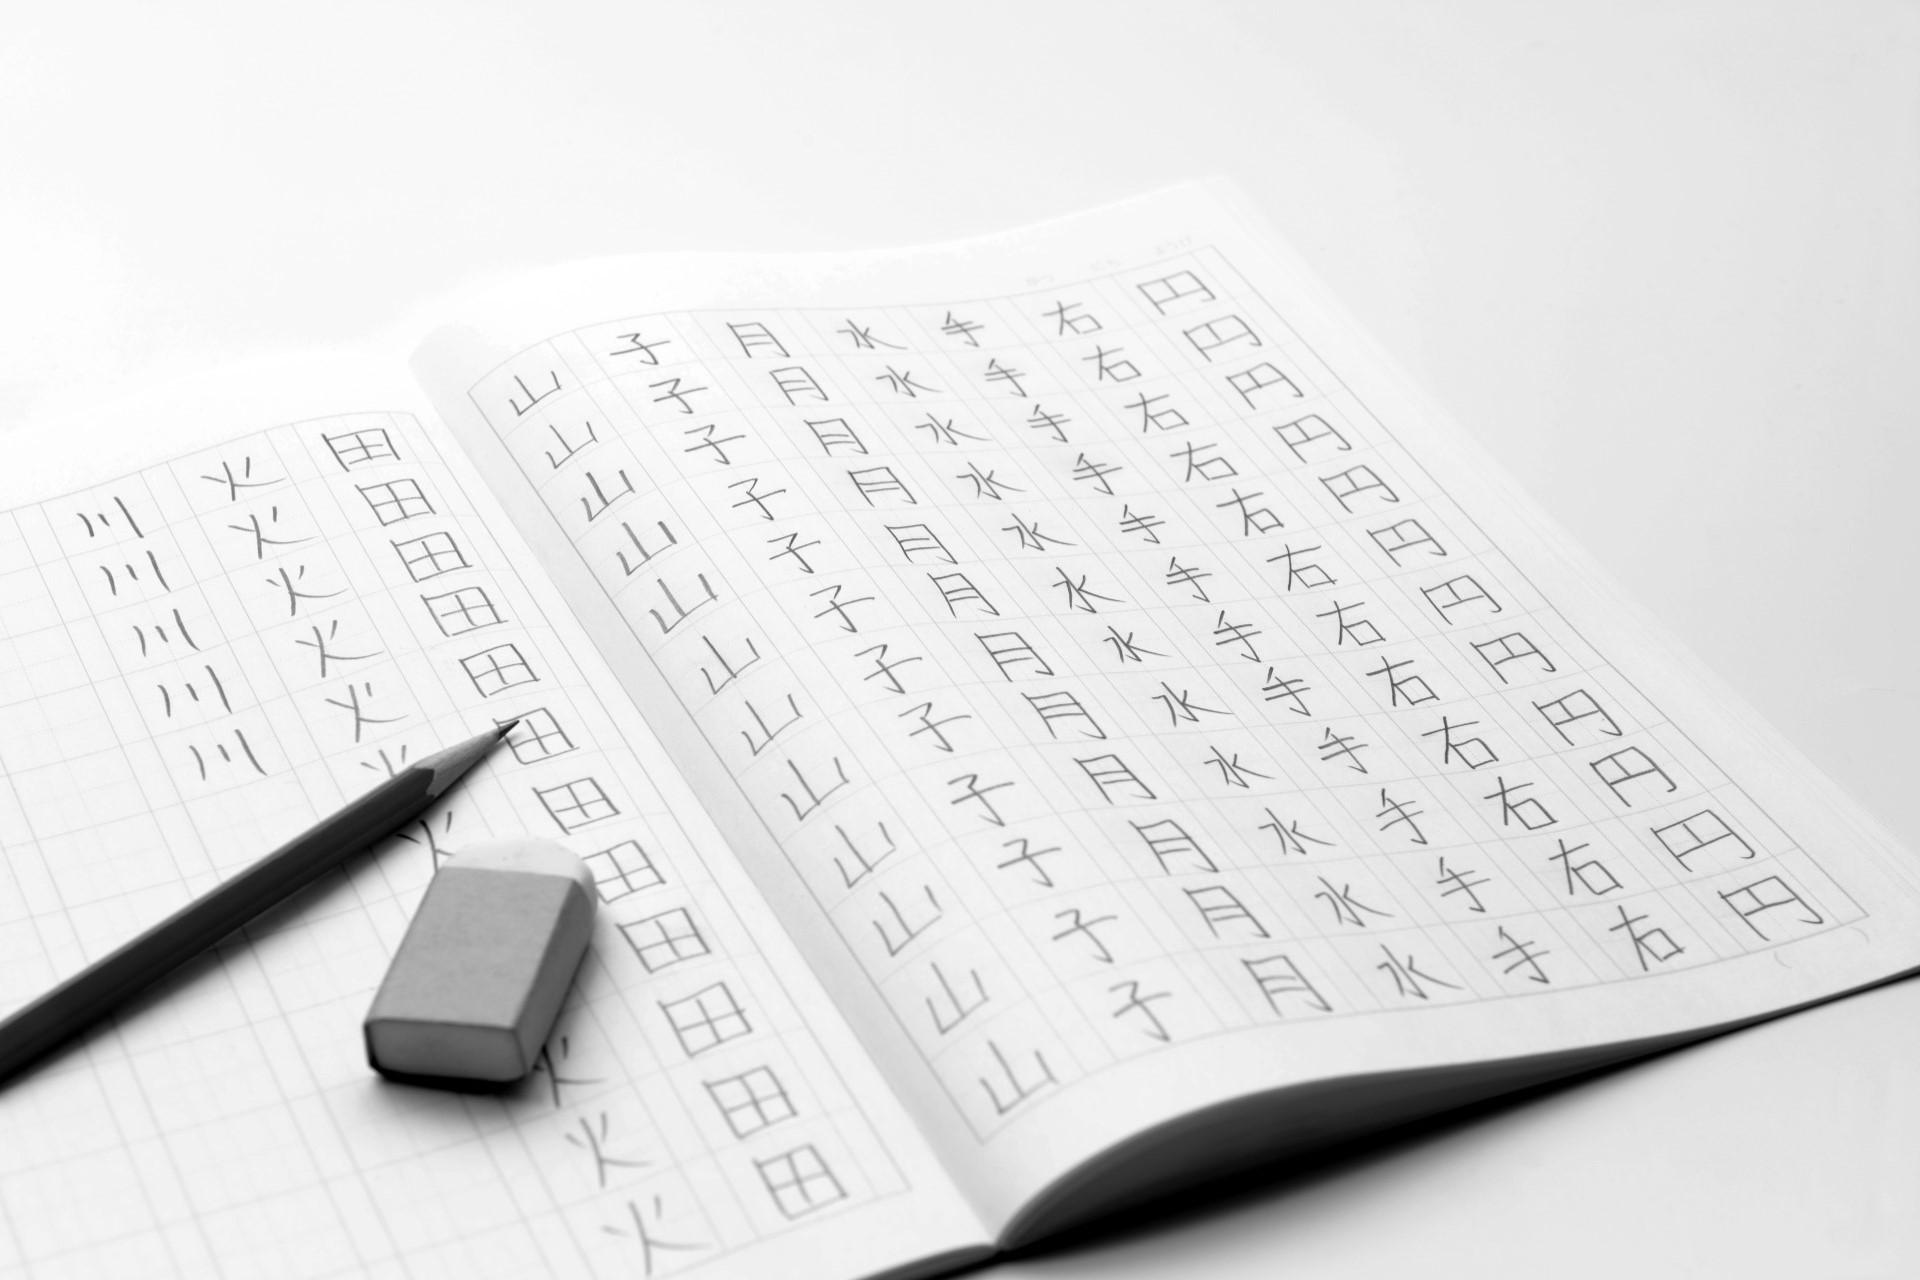 Hiragana, katakana e kanji, la lingua giapponese